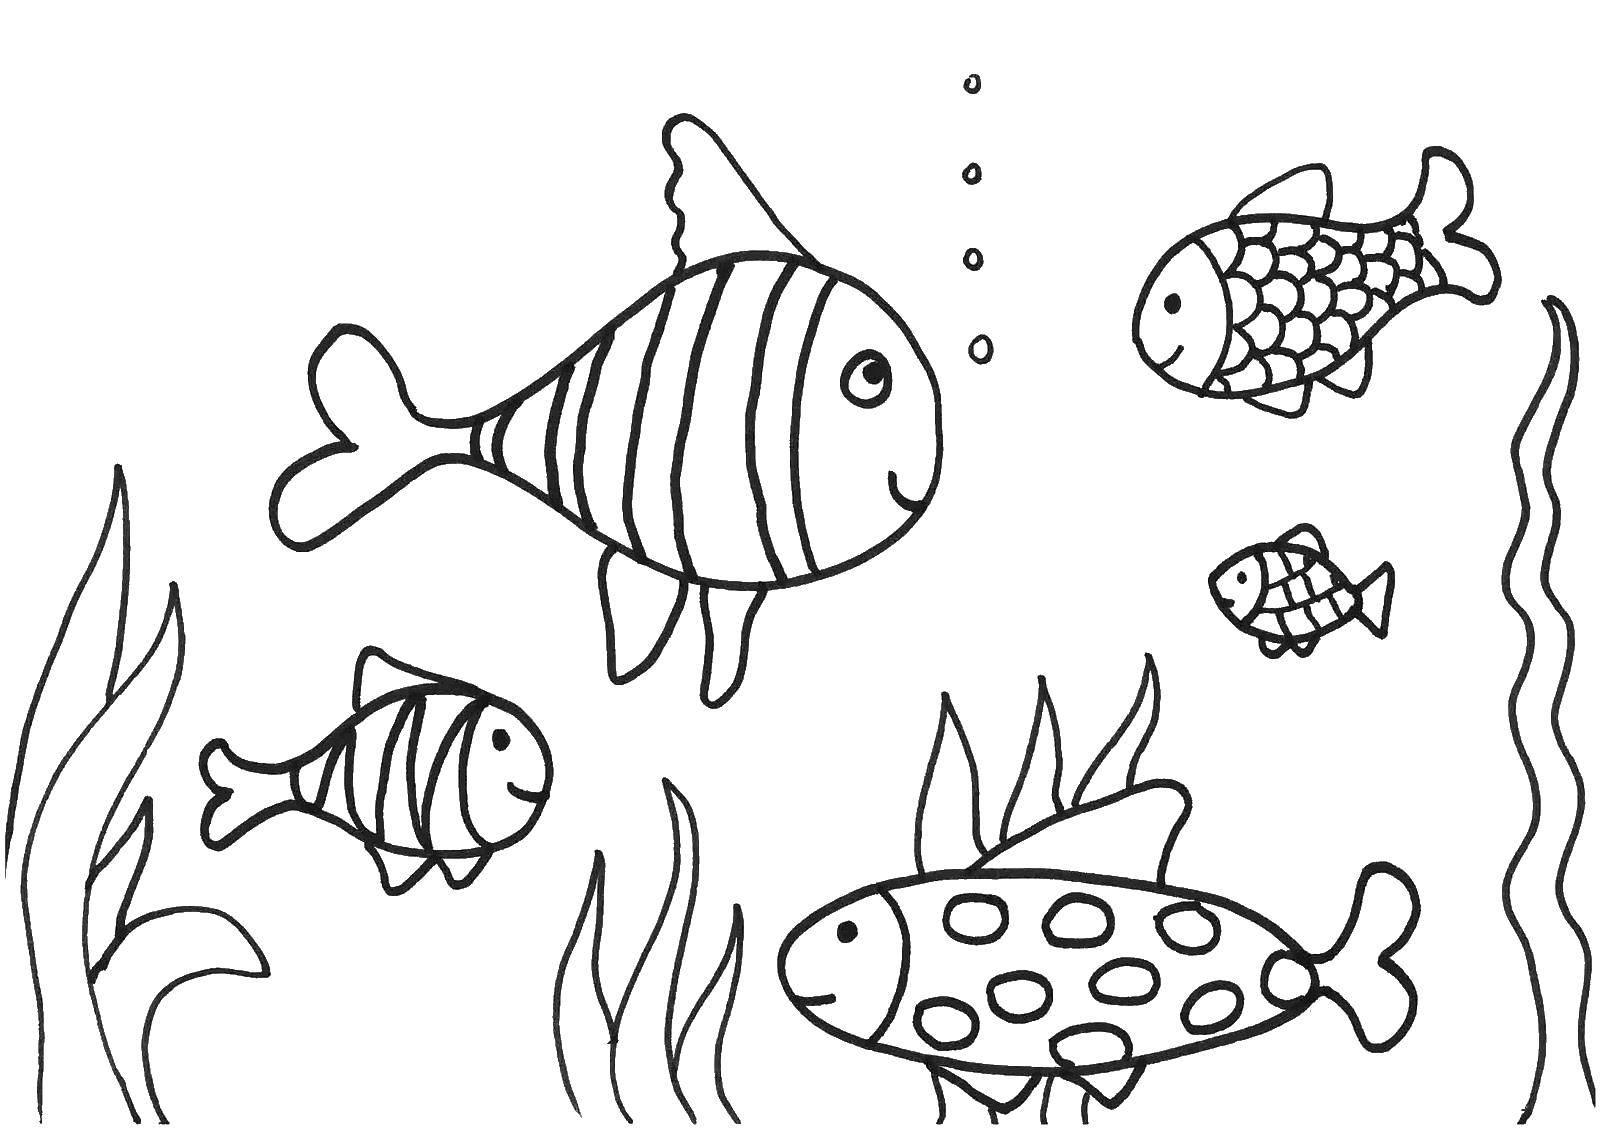 Coloring sheet fish Download .  Print